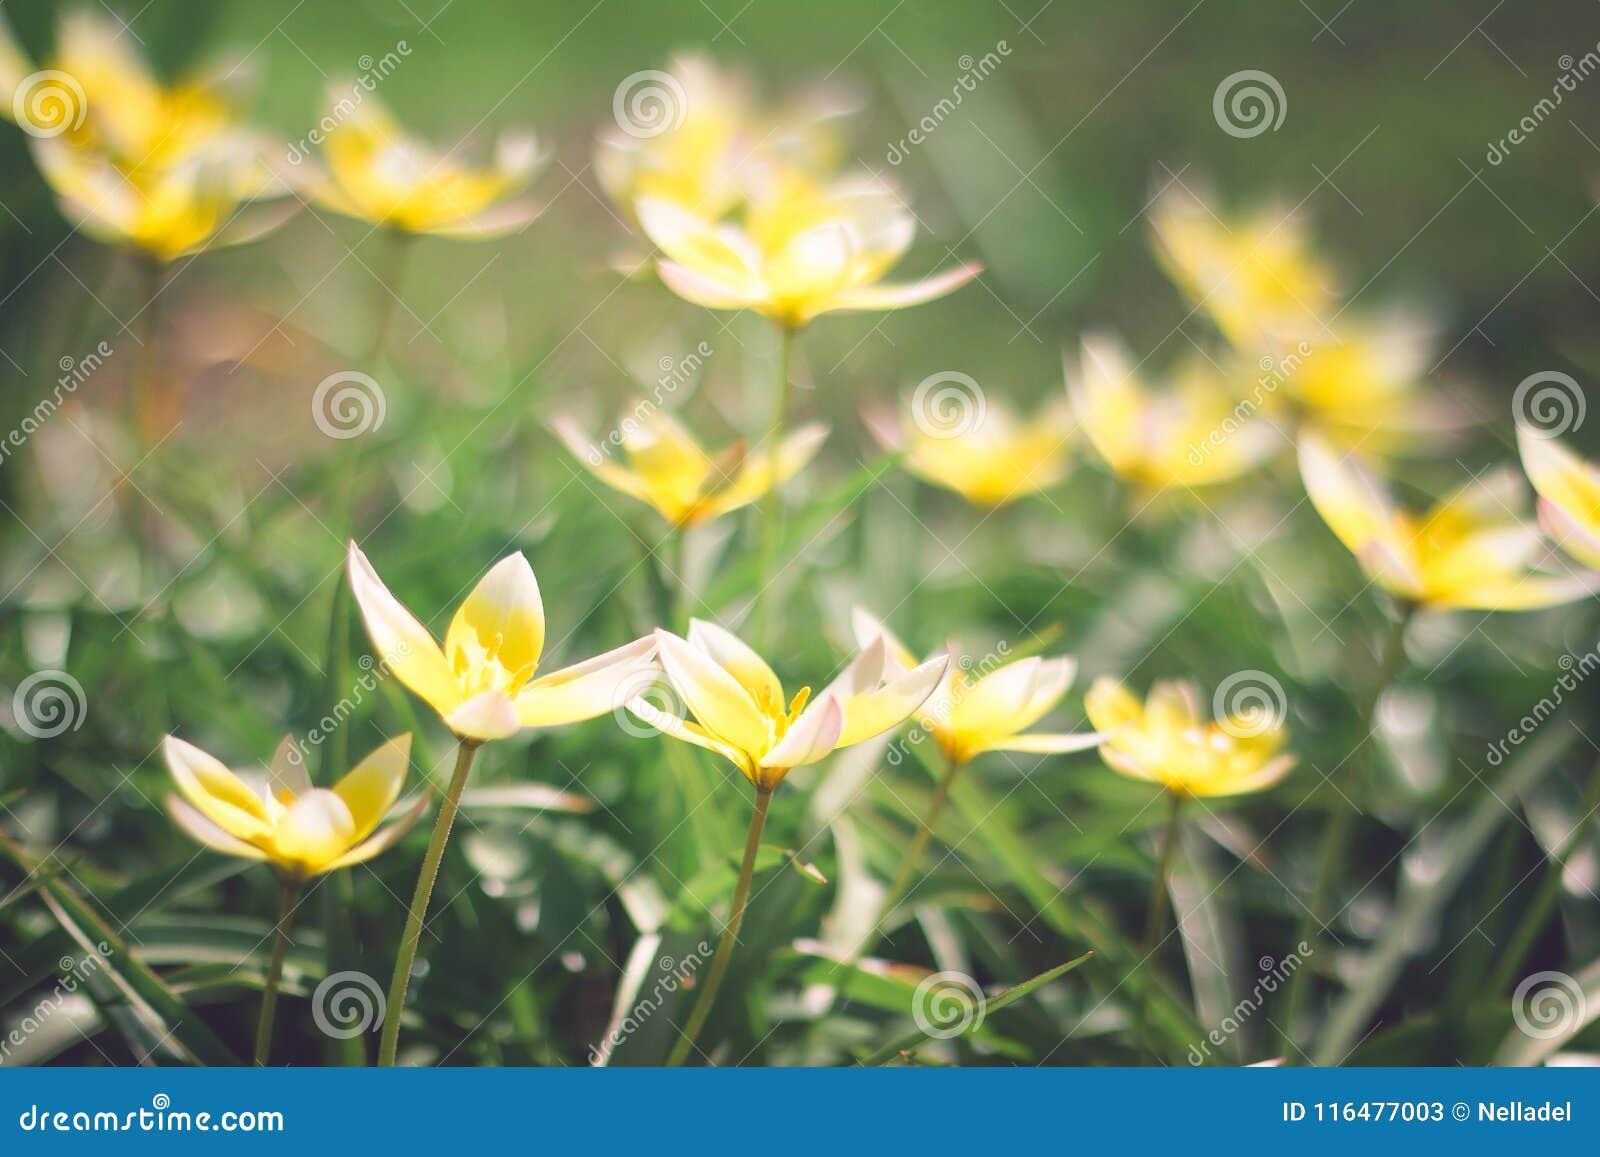 Small yellow flowers on flowerbed stock image image of ball small yellow flowers on flowerbed ball flower mightylinksfo